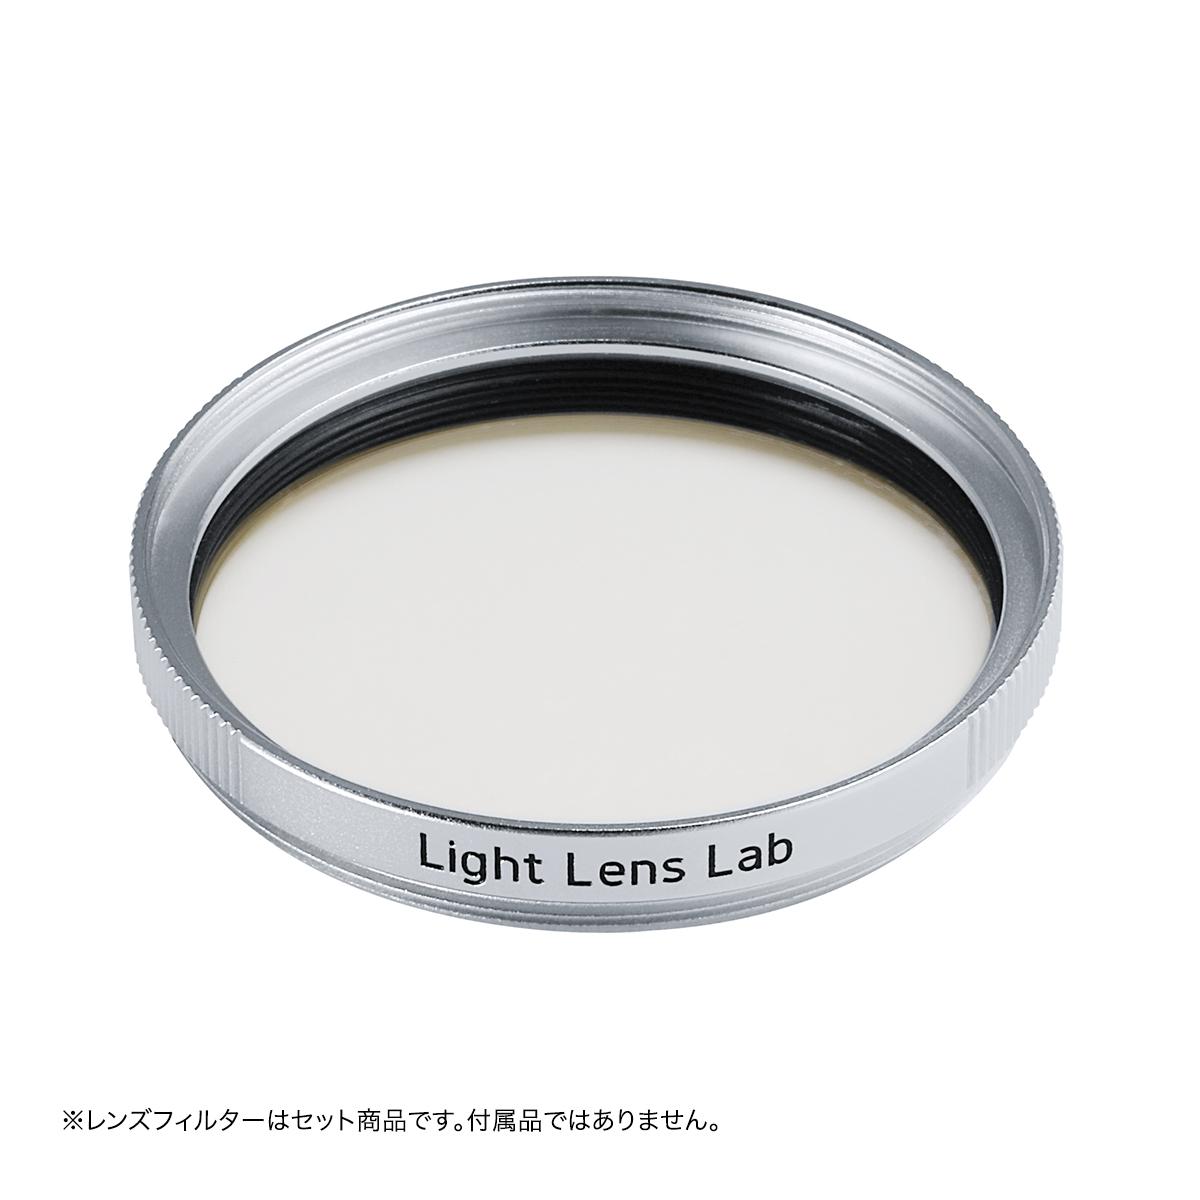 LIGHT LENS LAB M 35mm f/2 ライカM シルバー